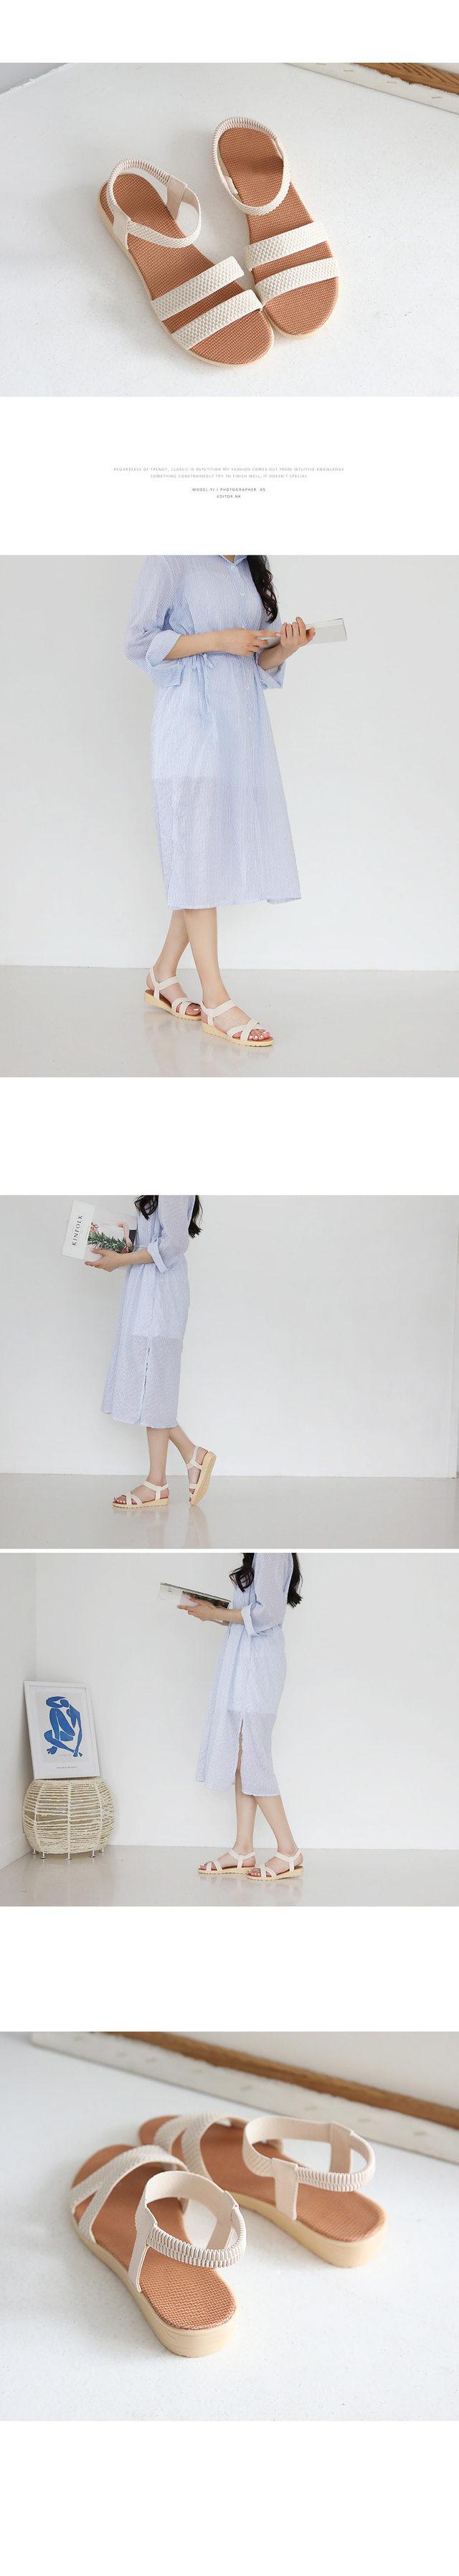 Hanelon Slingback Sandals 3cm